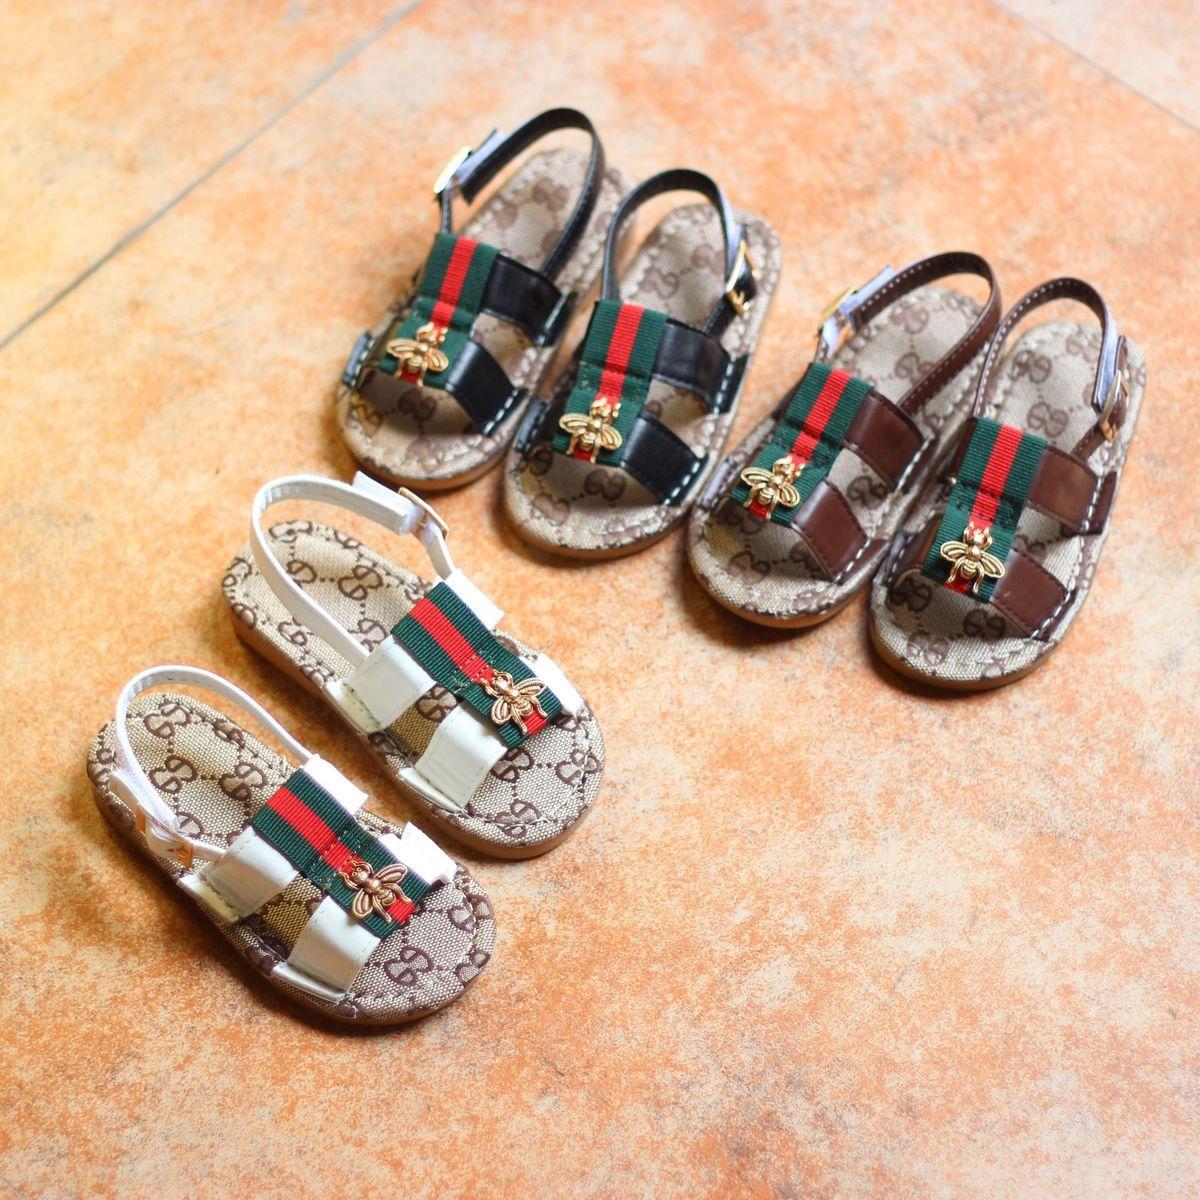 Children S Cool Shoes 2018 Summer Boy And Girl Sandals Beach Slipper Soft  Bottom Comfortable Leisure Joker Stripe Design Kid Boy Shoes Boys And Girls  Shoes ... a399d54bb